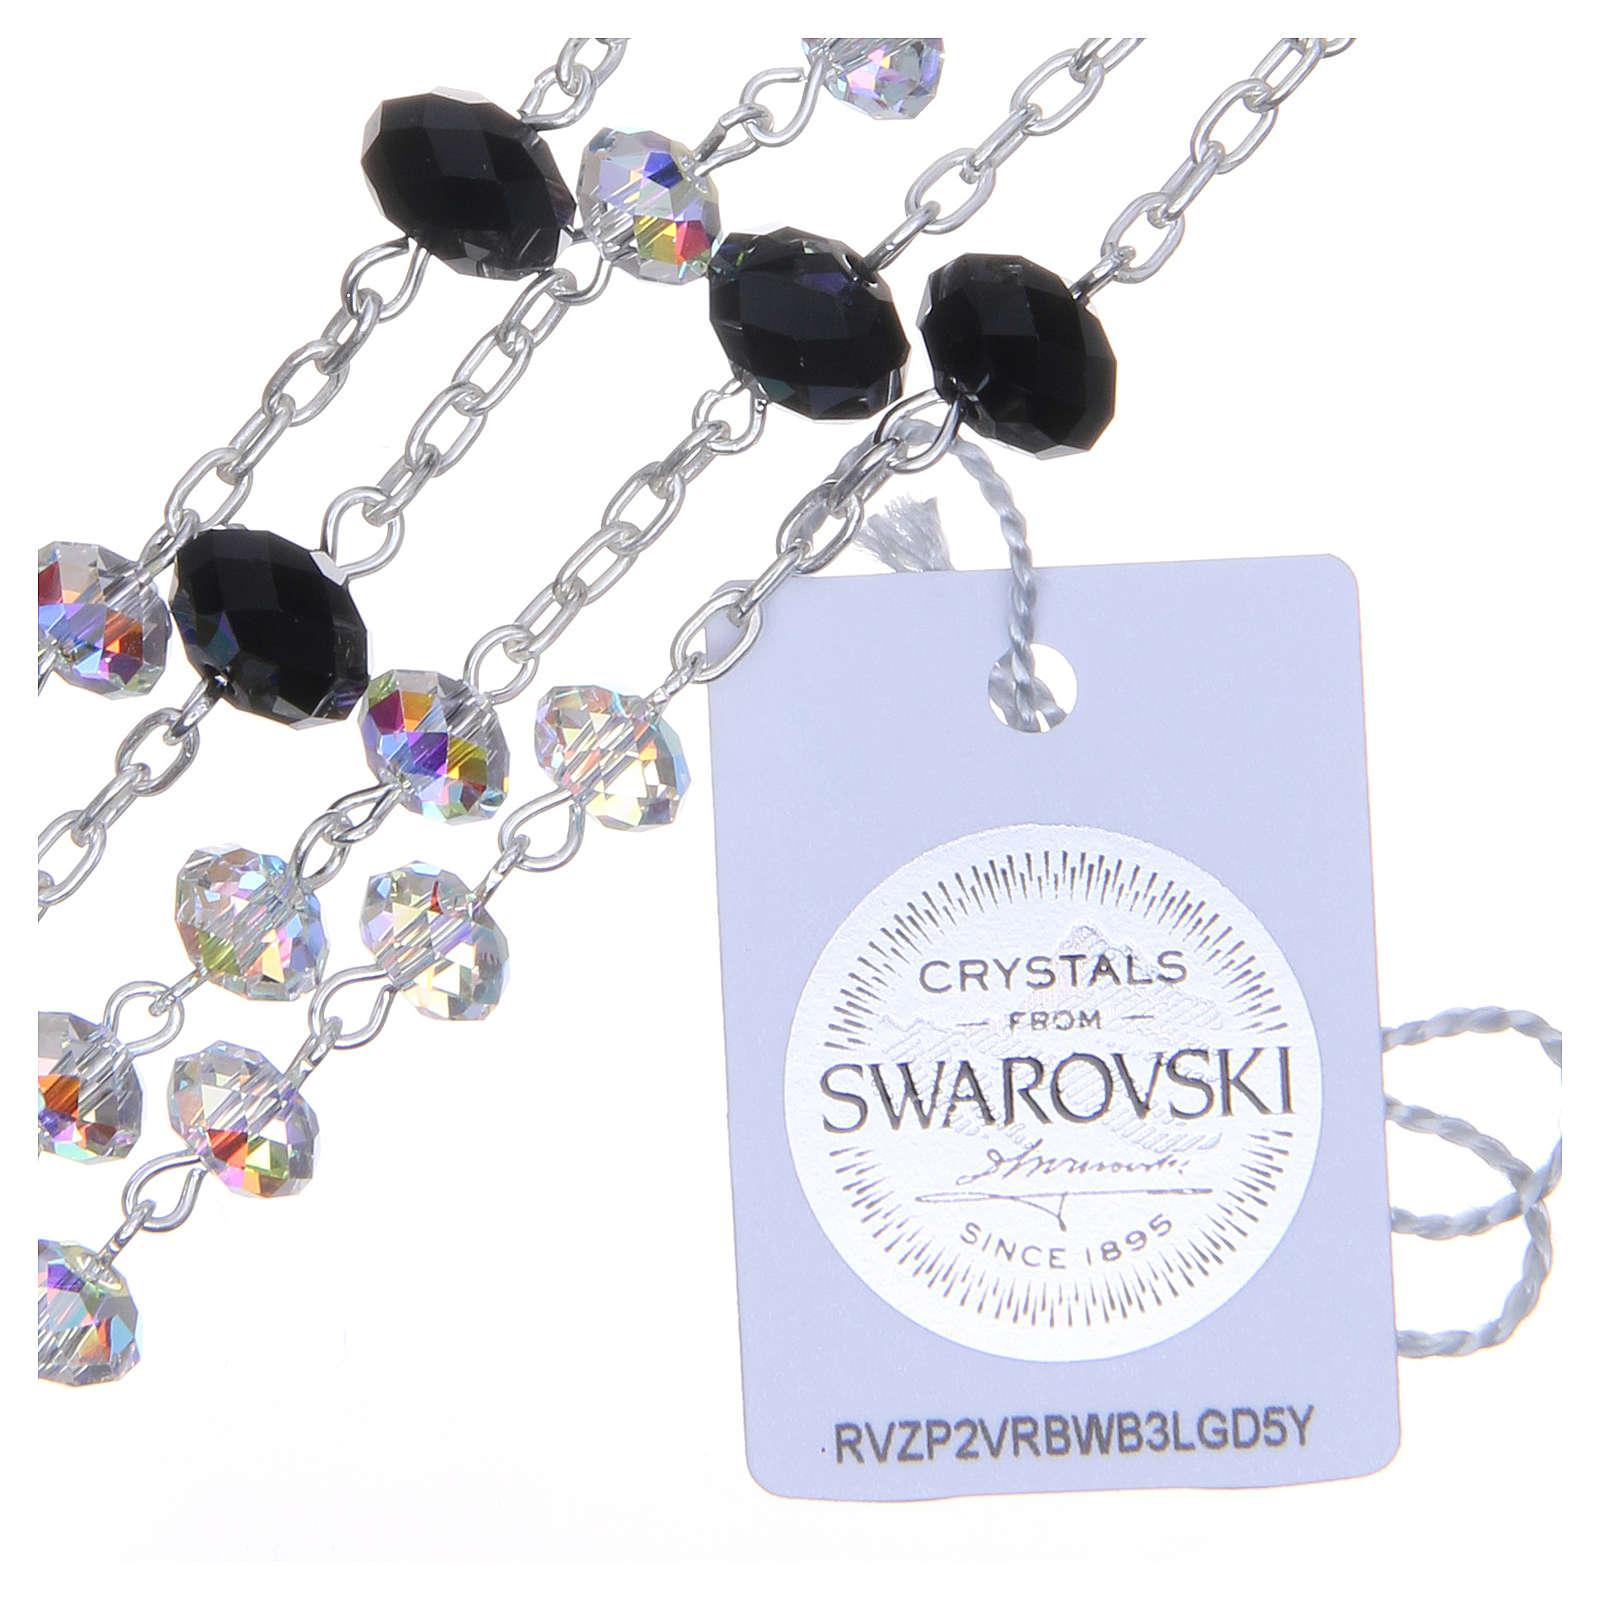 Chapelet argent 925 cristal Swarovski briolette 6 mm blanc/noir 4